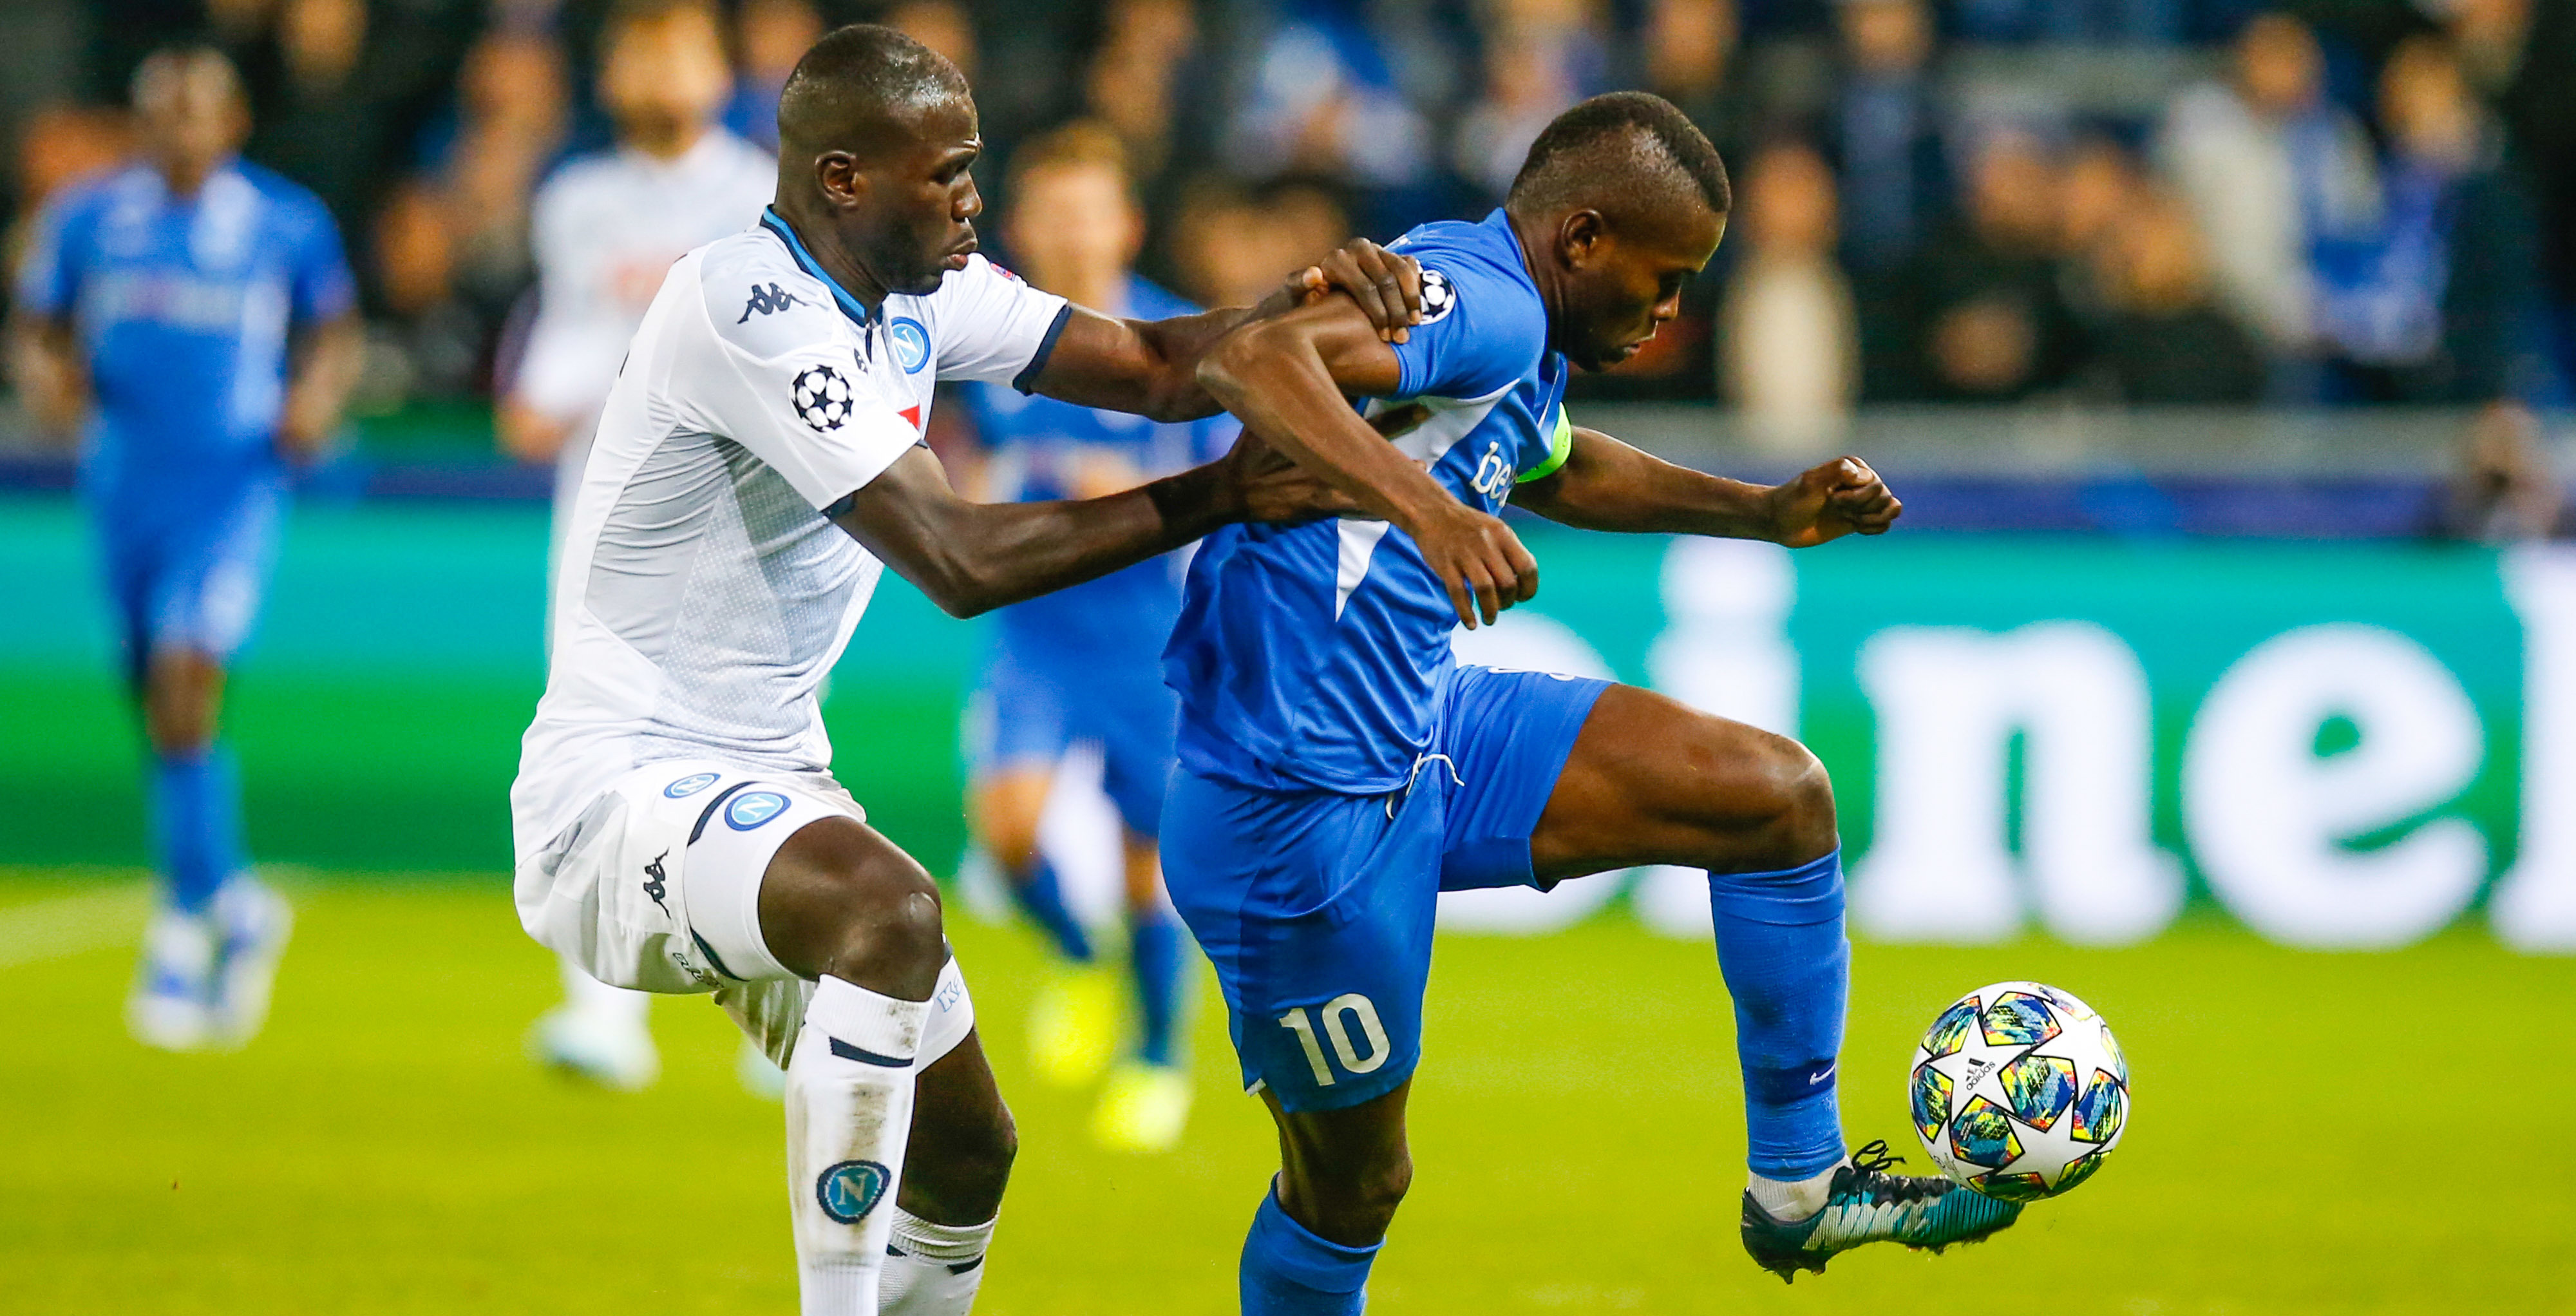 Aly Samatta - KRC Genk - Champions League 19-20